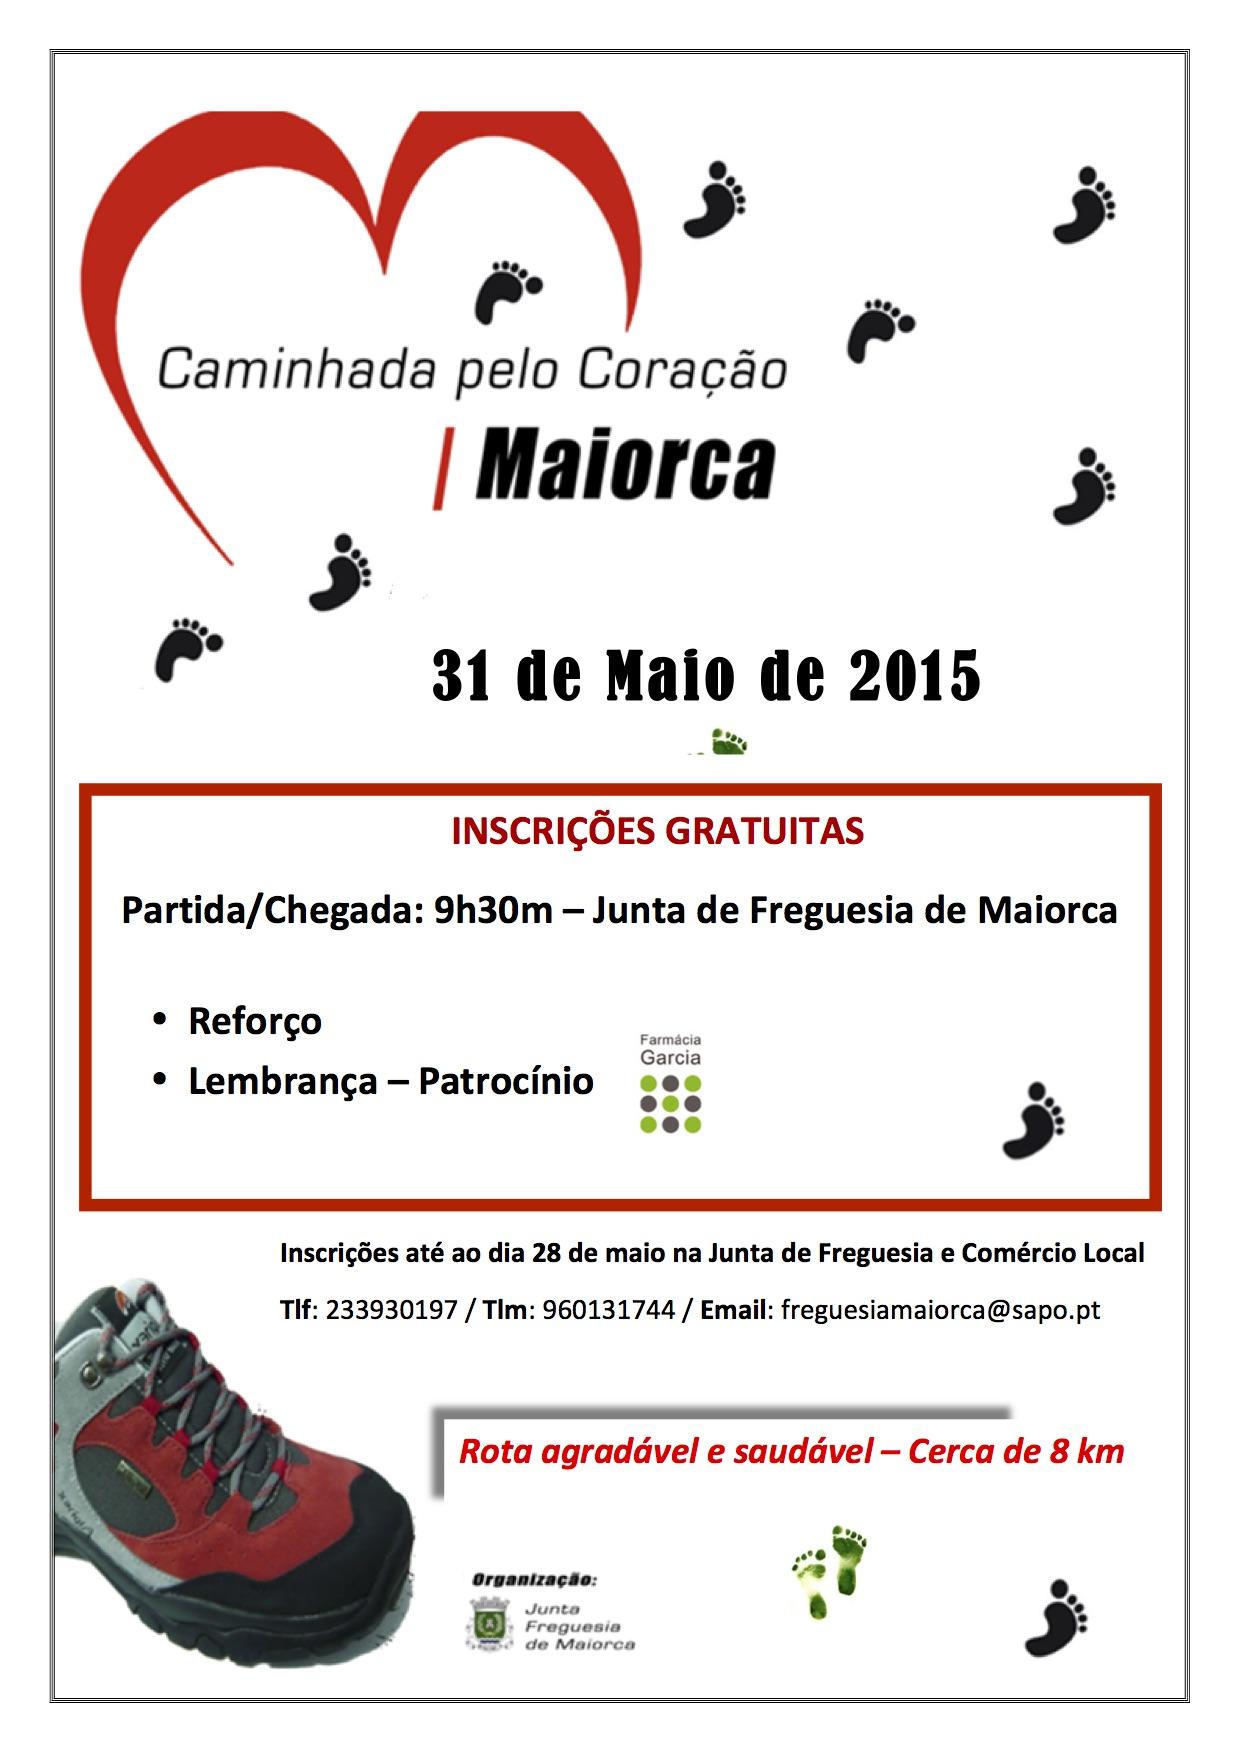 cartaz caminhada 2015.jpg